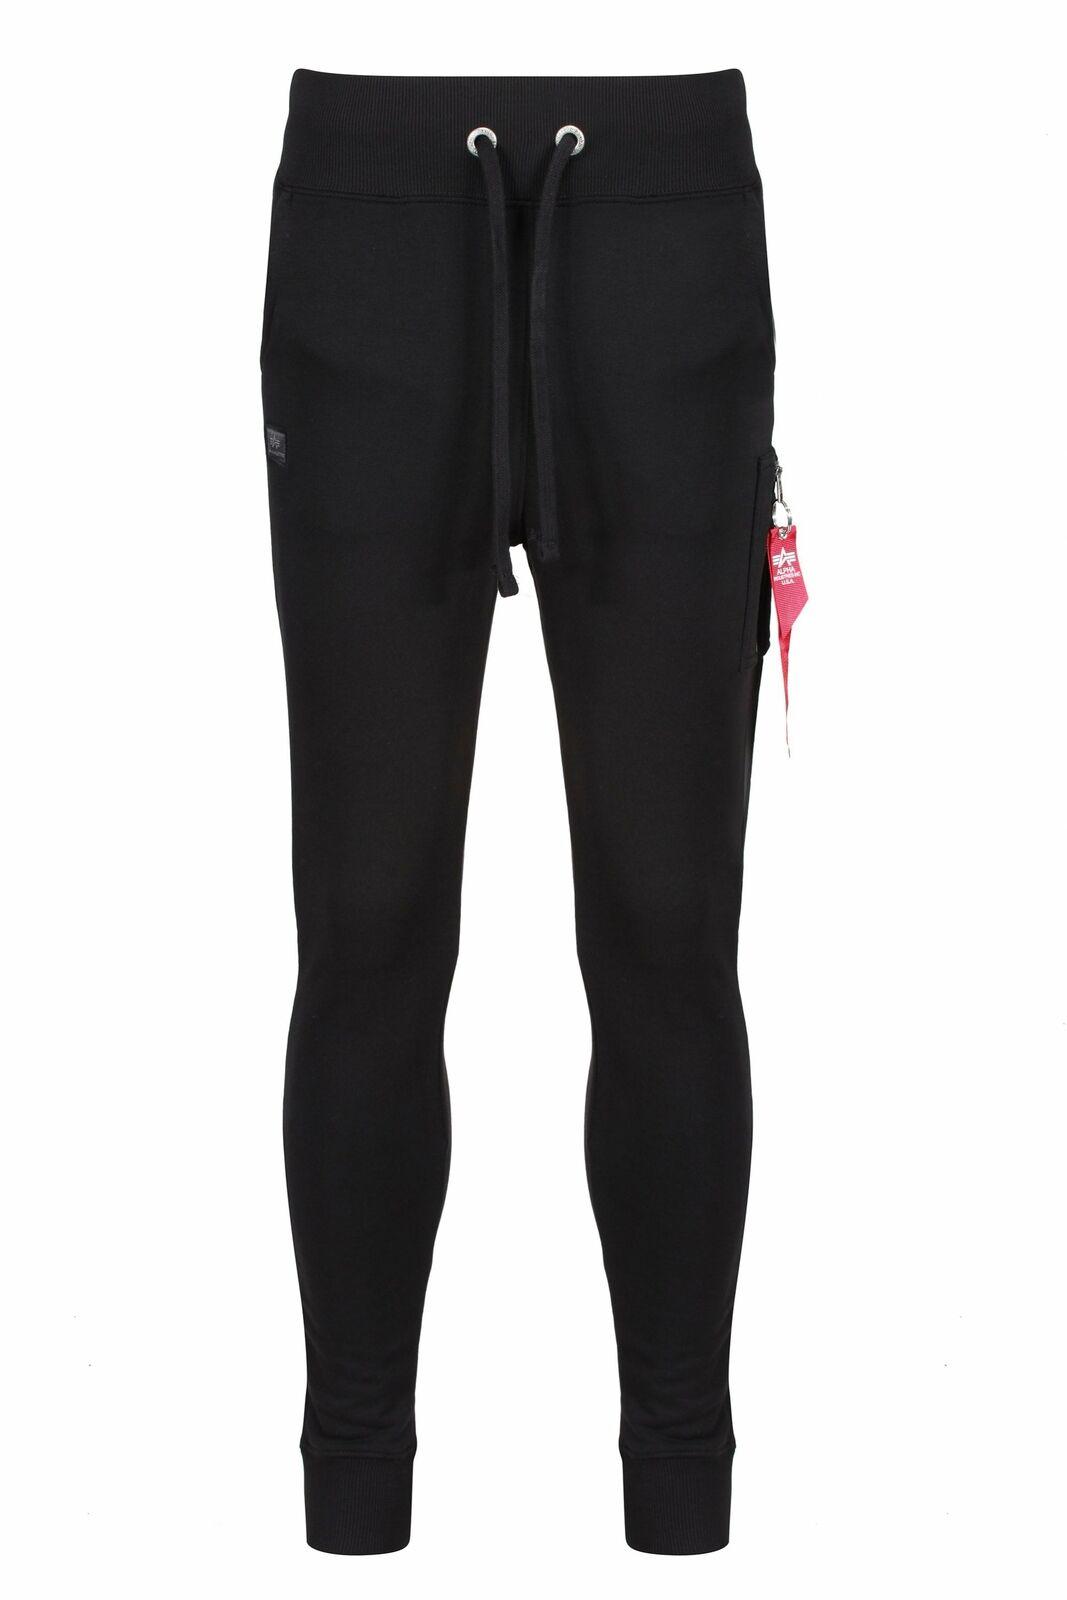 ALPHA INDUSTRIES X-Fit Slim Cargo Pant | Black